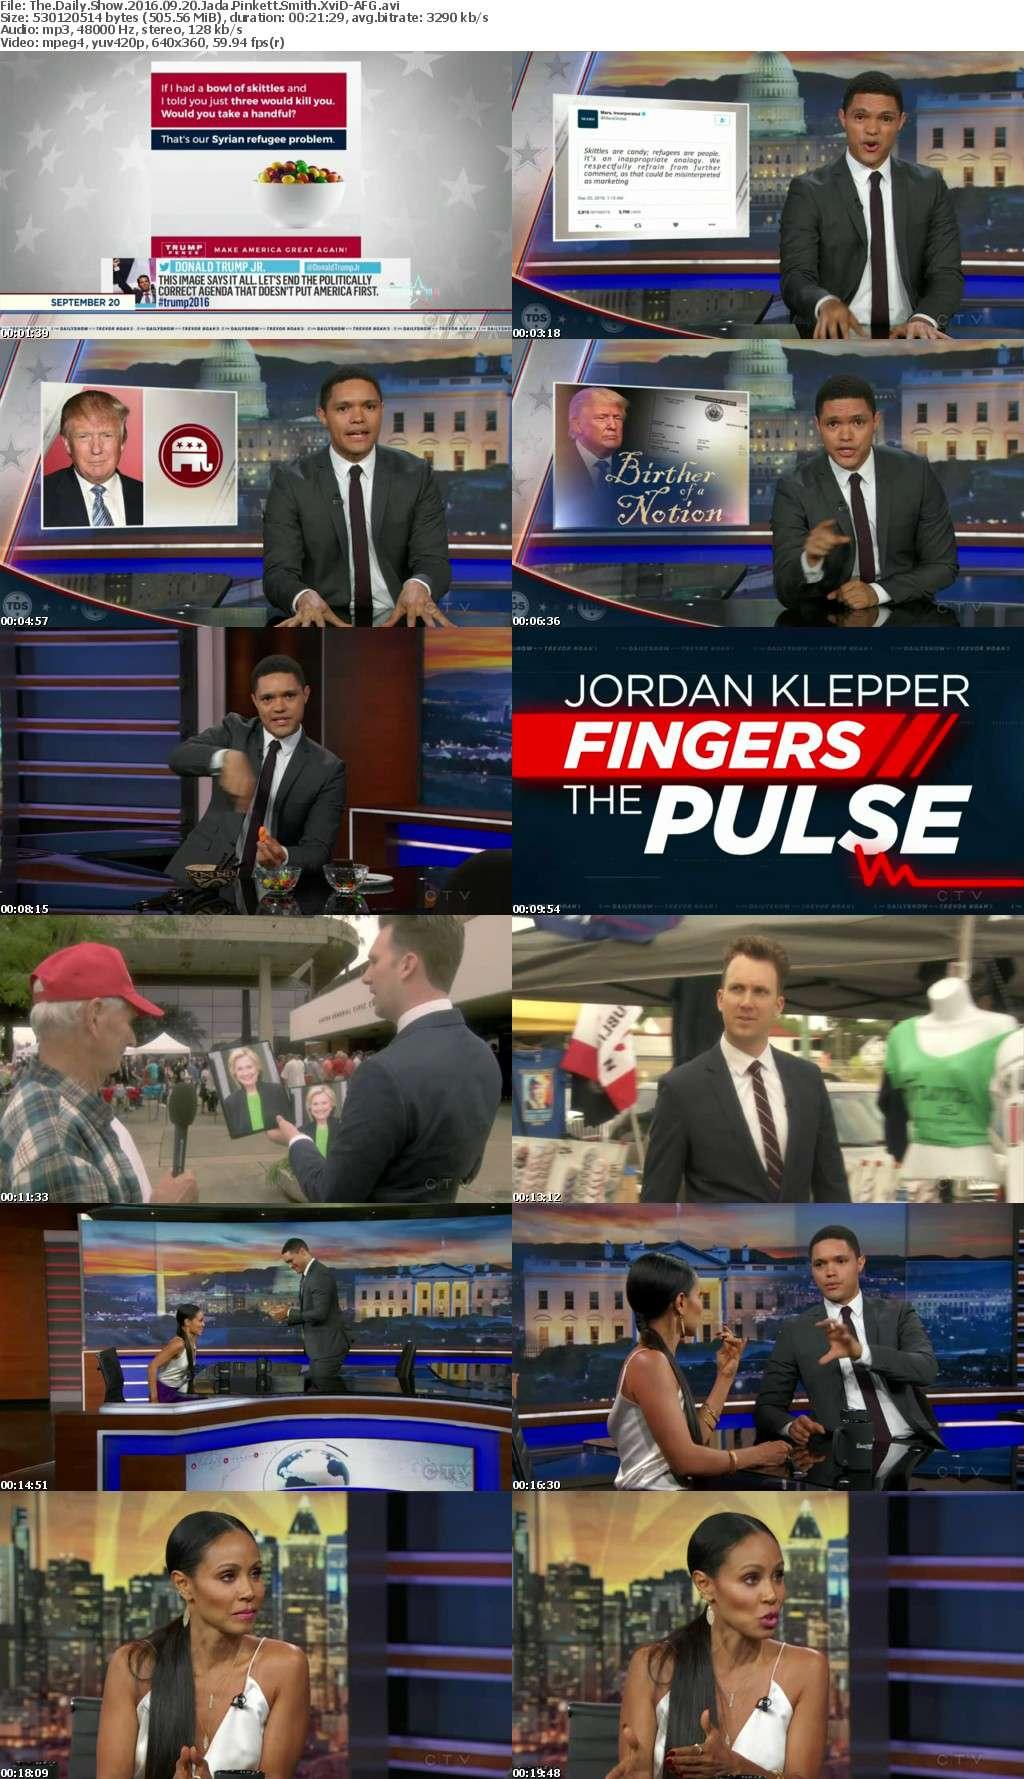 The Daily Show 2016 09 20 Jada Pinkett Smith XviD-AFG